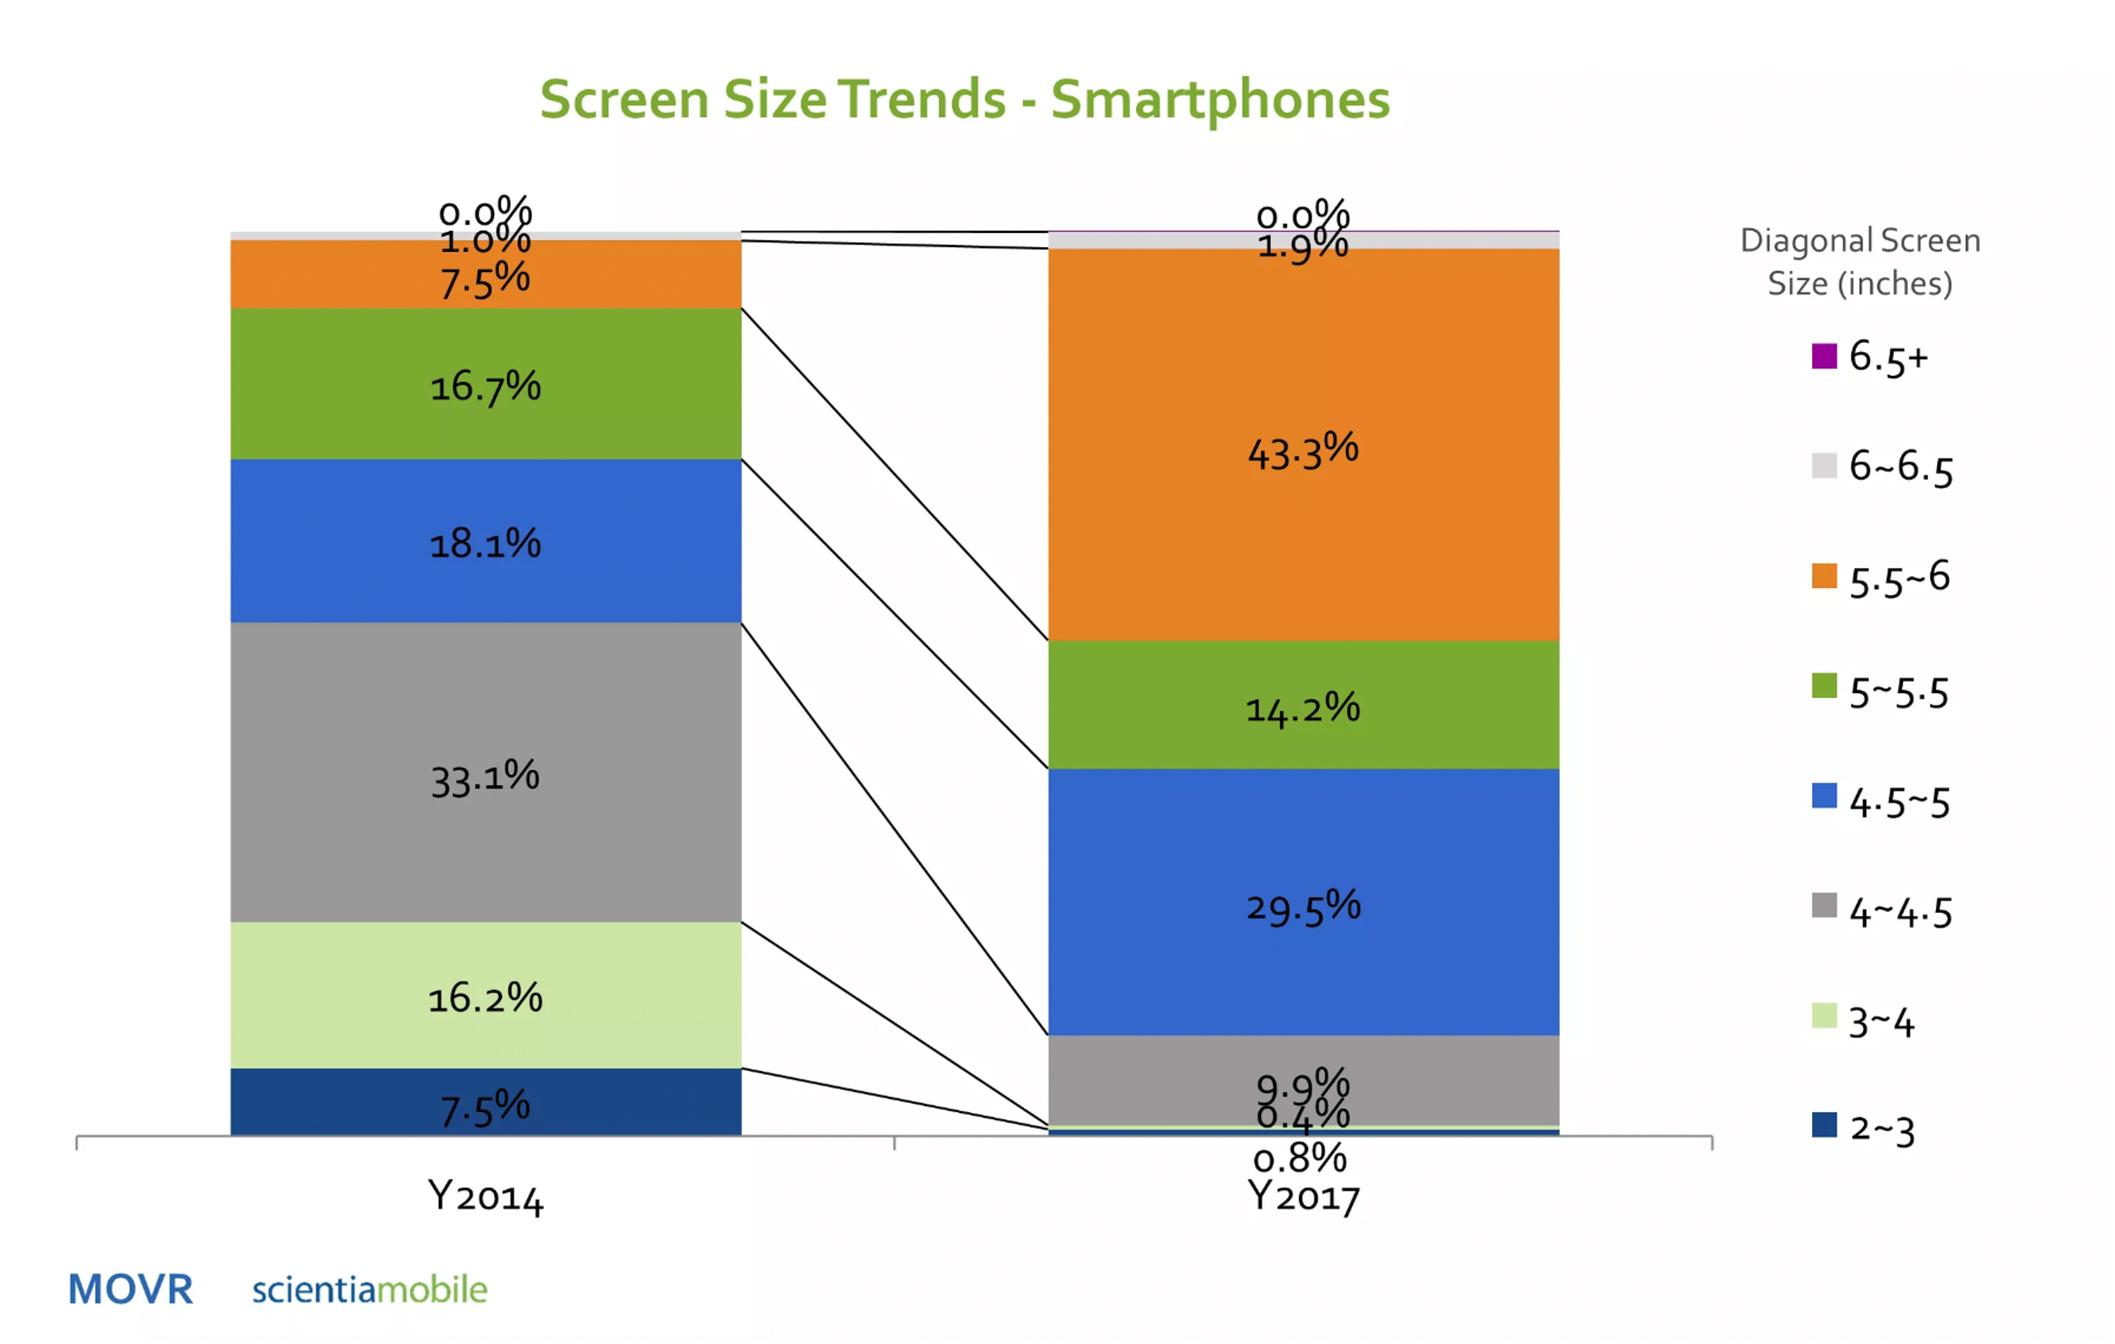 Bottom Navigation Pattern On Mobile Web Pages: A Better Alternative?